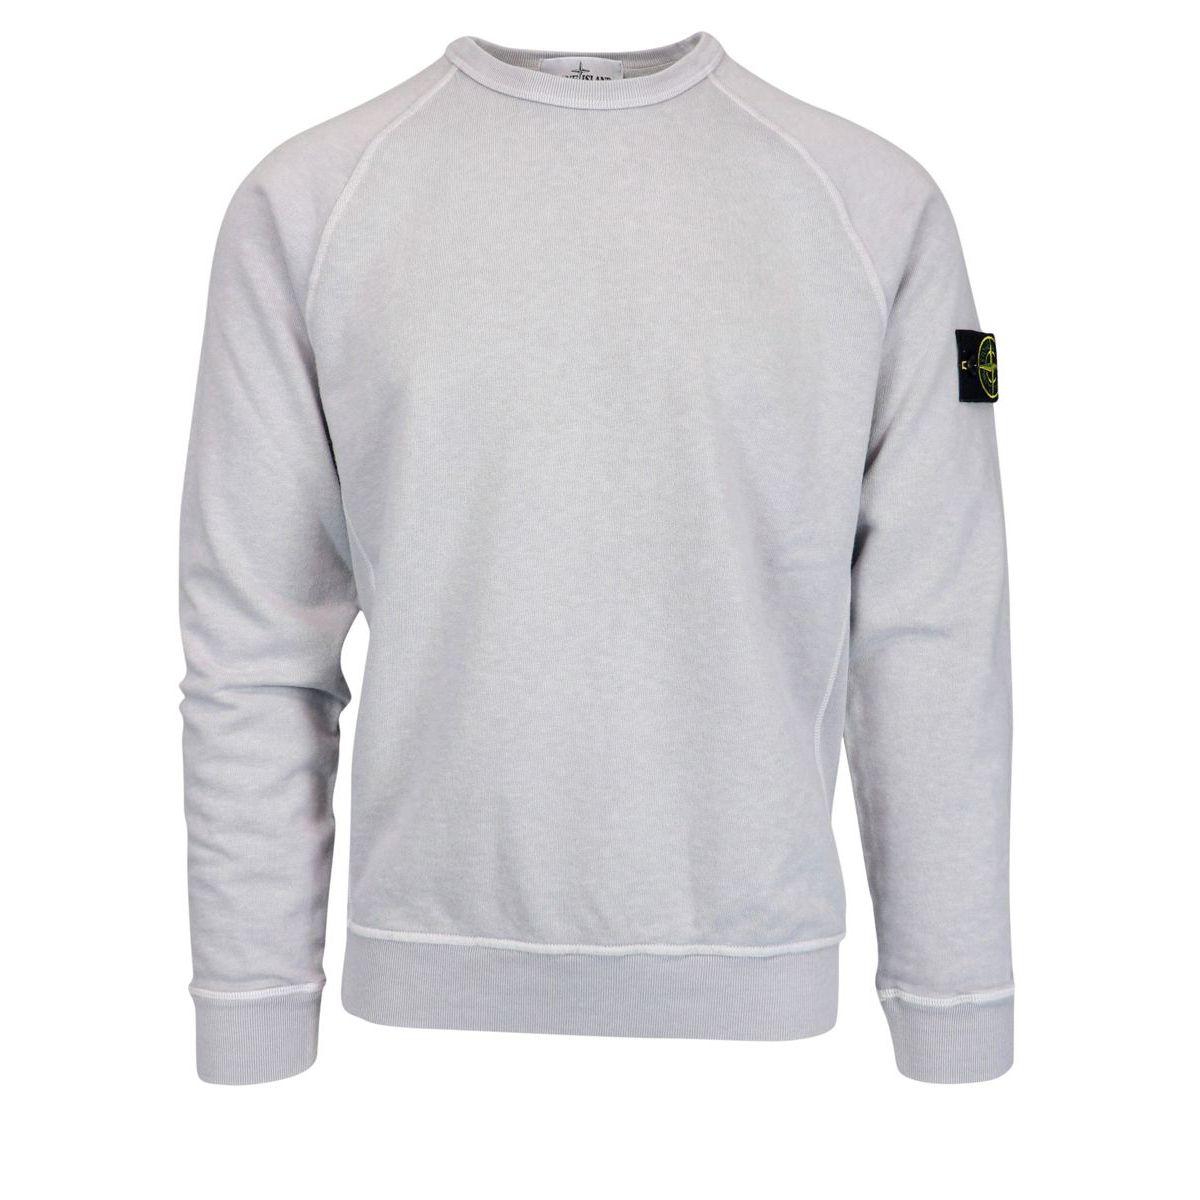 """Washed effect"" crewneck sweatshirt with logo patch Powder Stone Island"